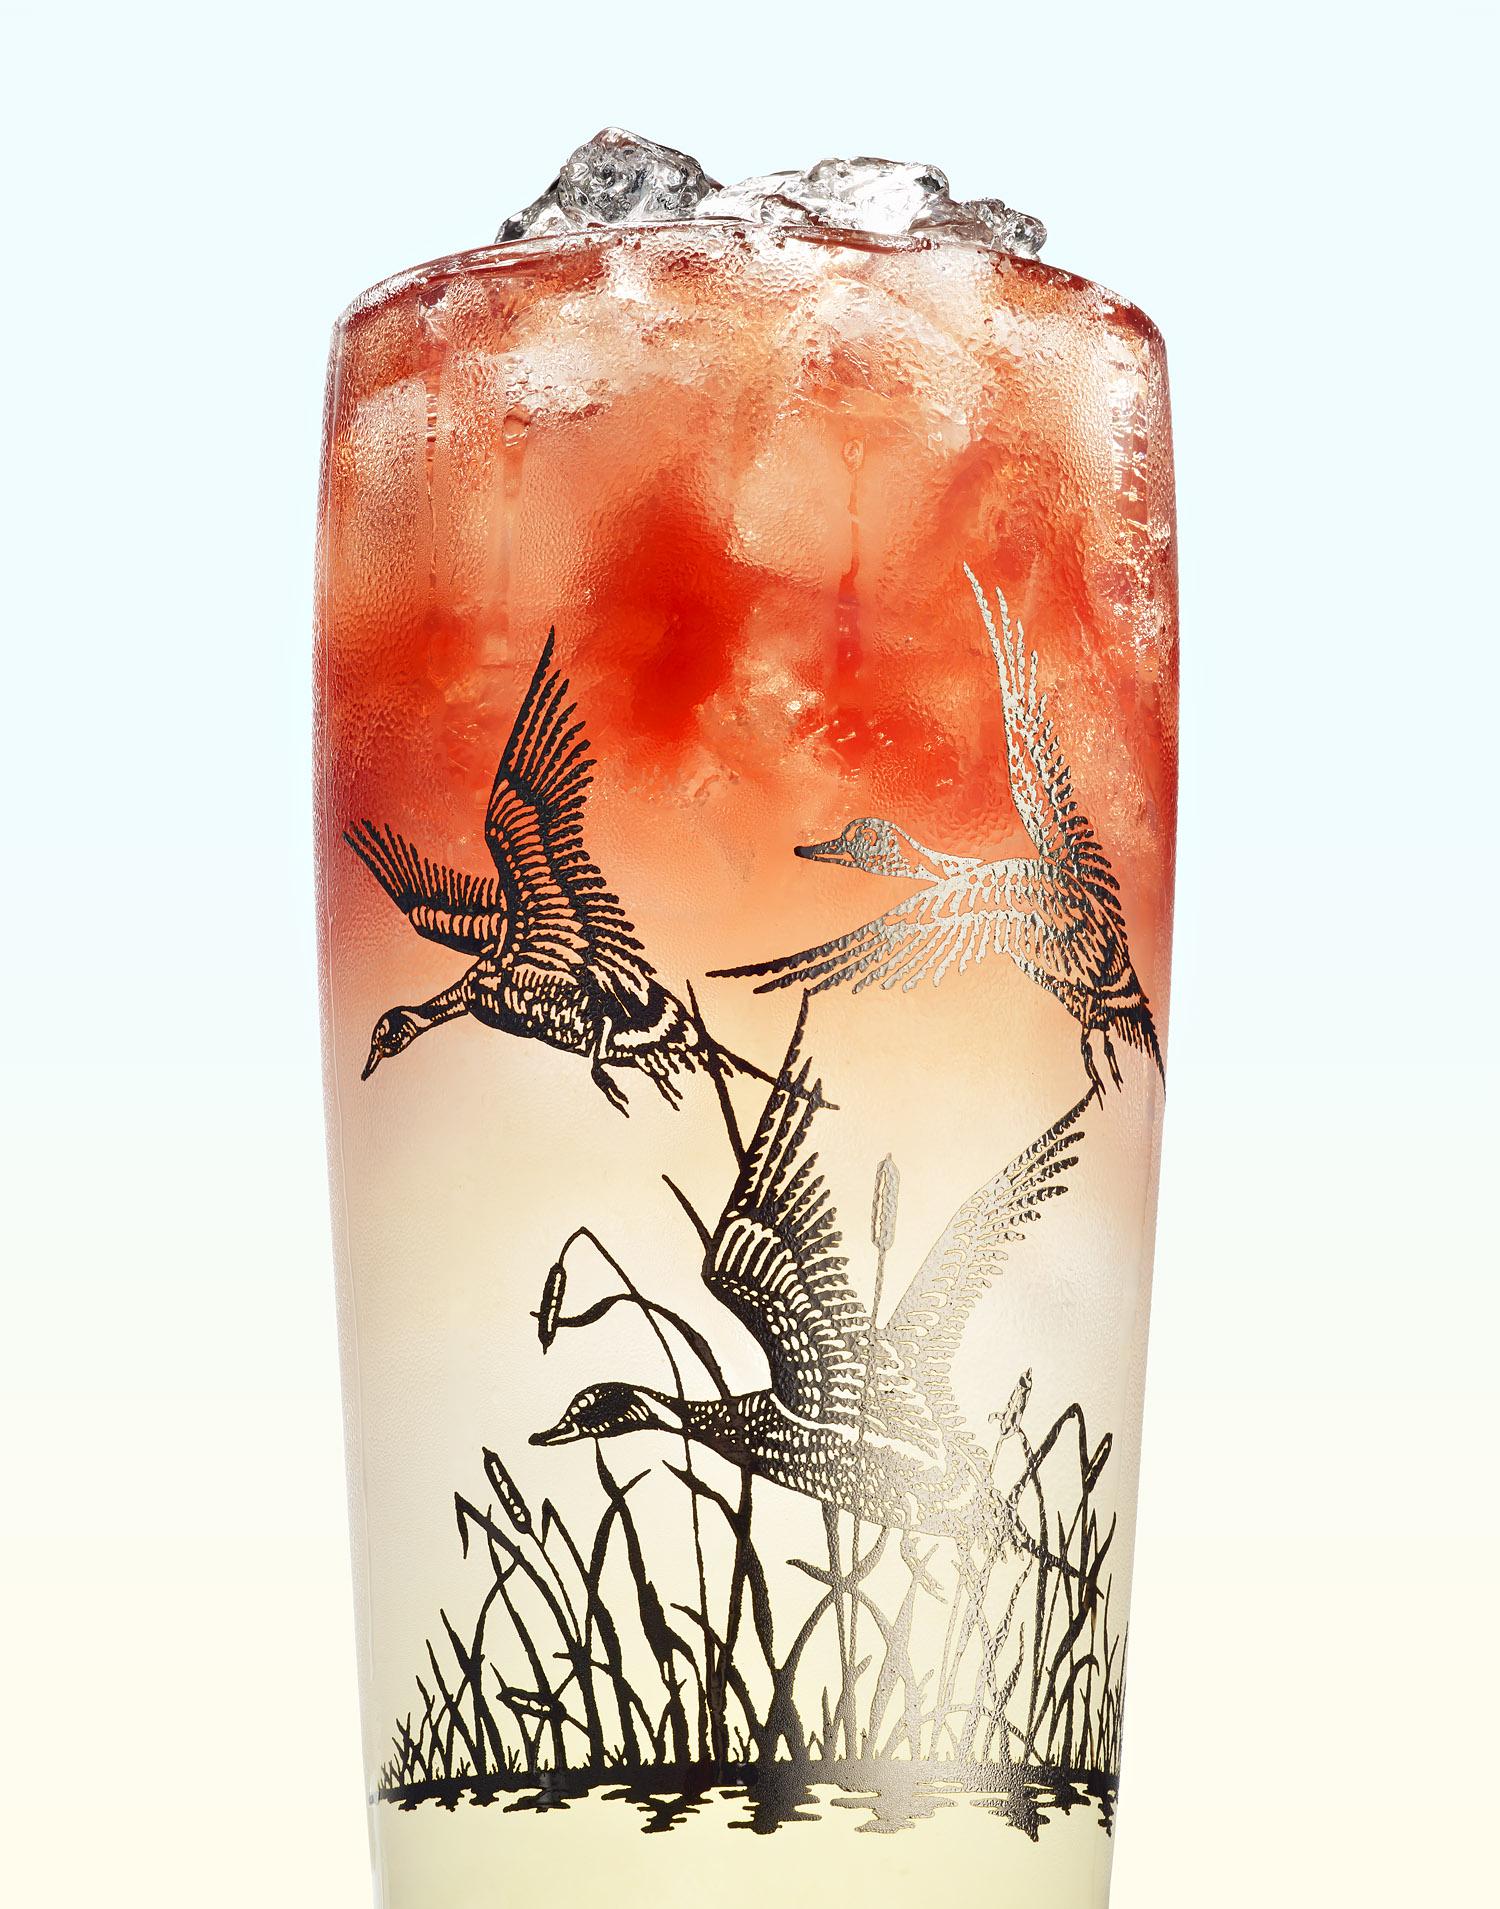 Sweet Bourbon Lemonade